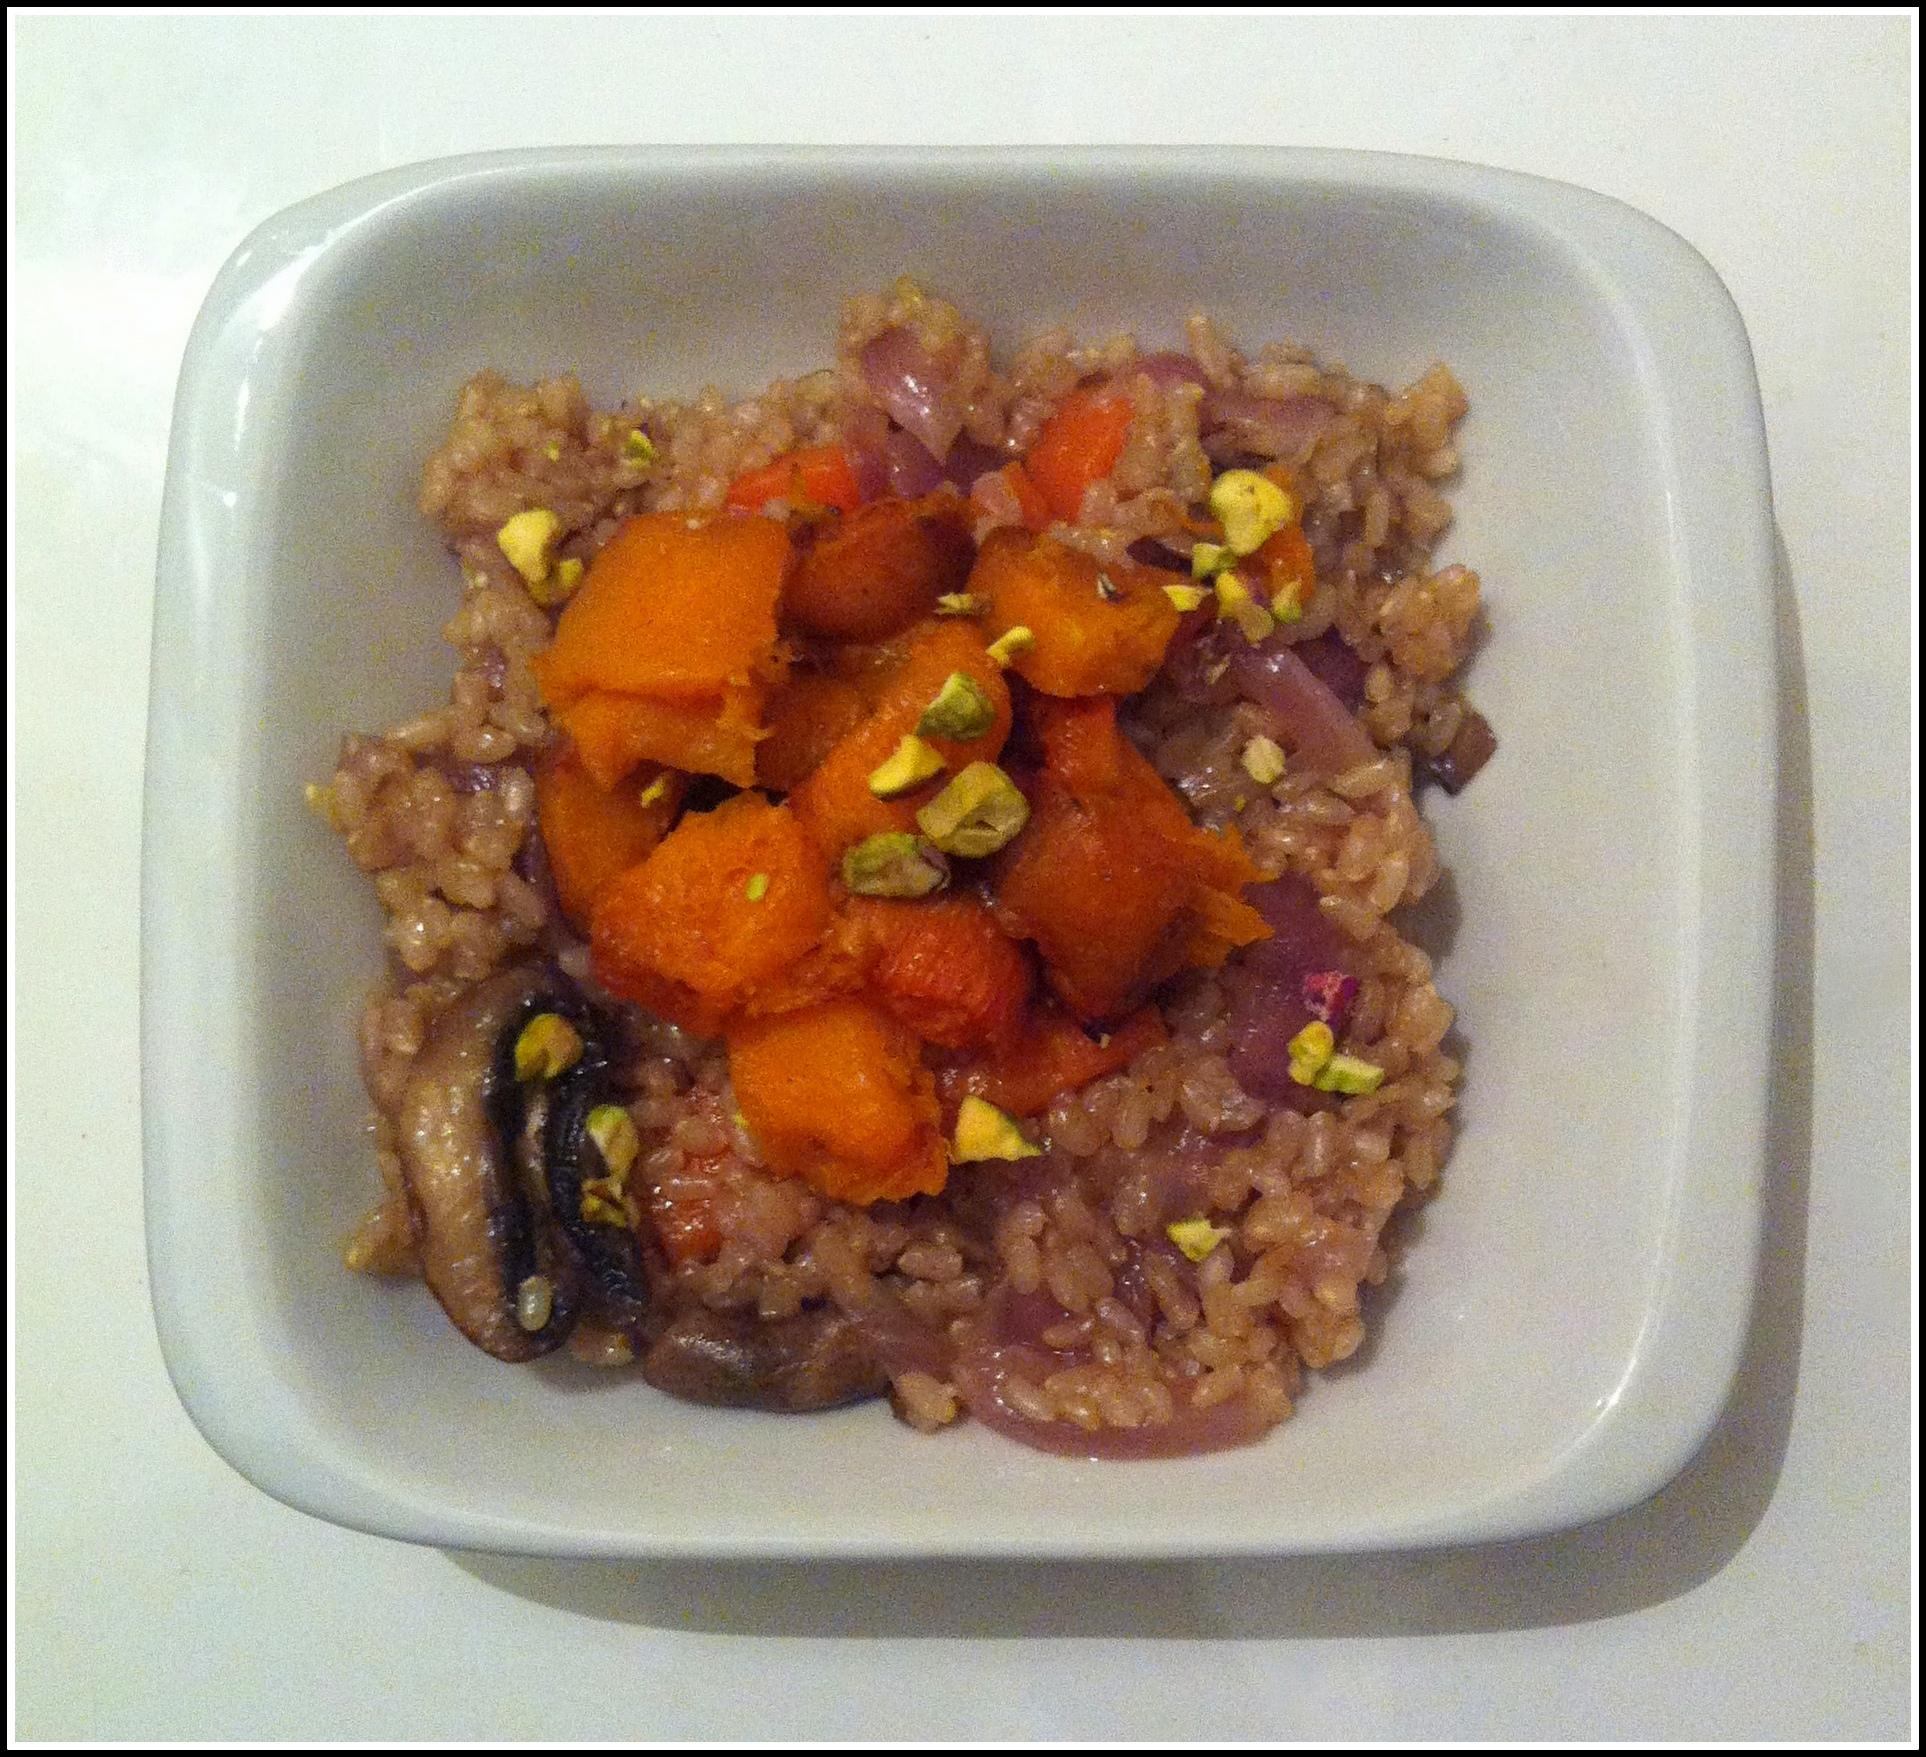 Vegan Brown Rice with carrots sweet potatoes pumpkin and mushrooms